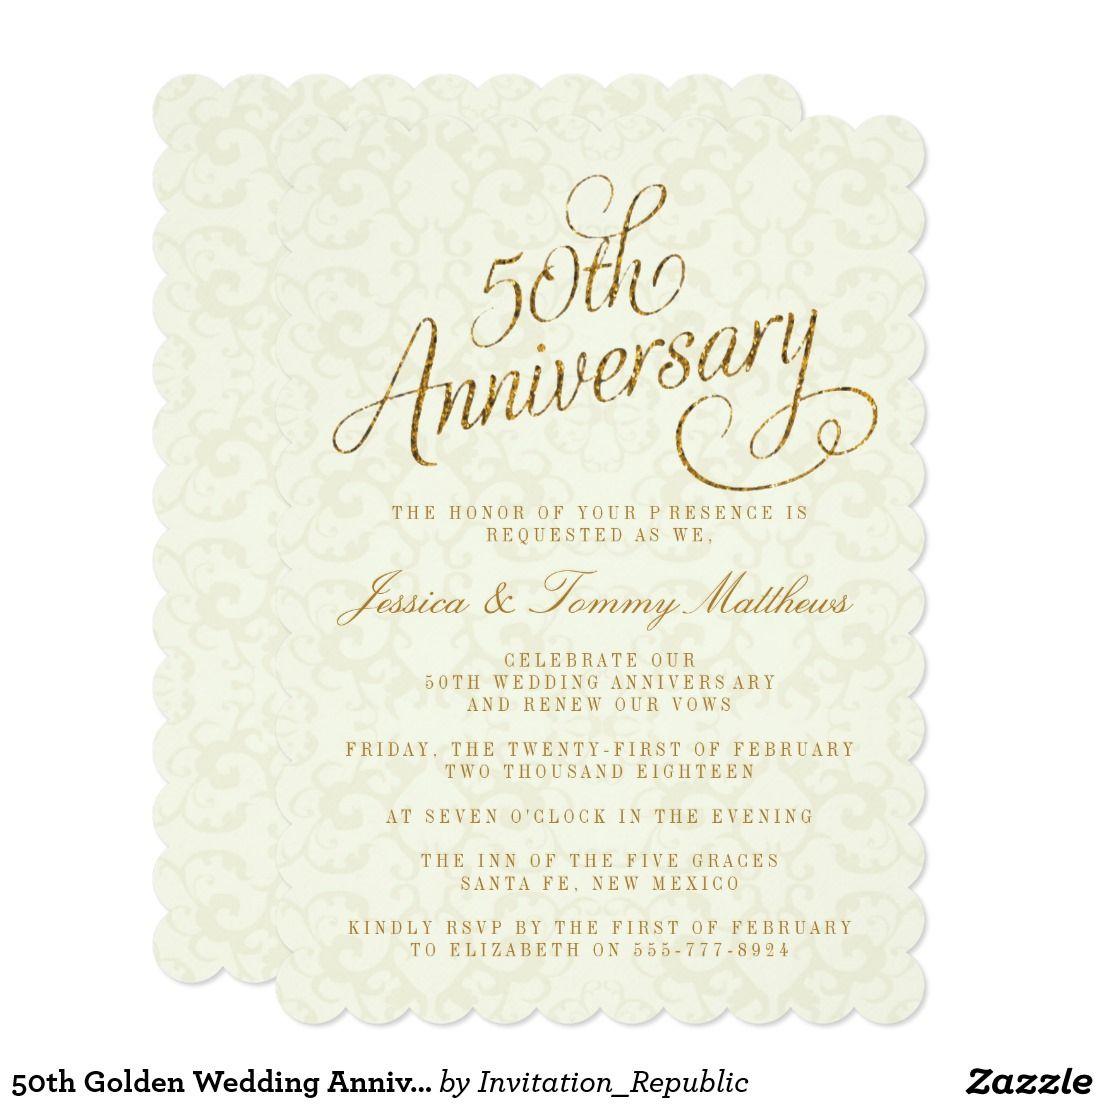 Www Zazzle Com Wedding Invitations: 50th Golden Wedding Anniversary Invitations